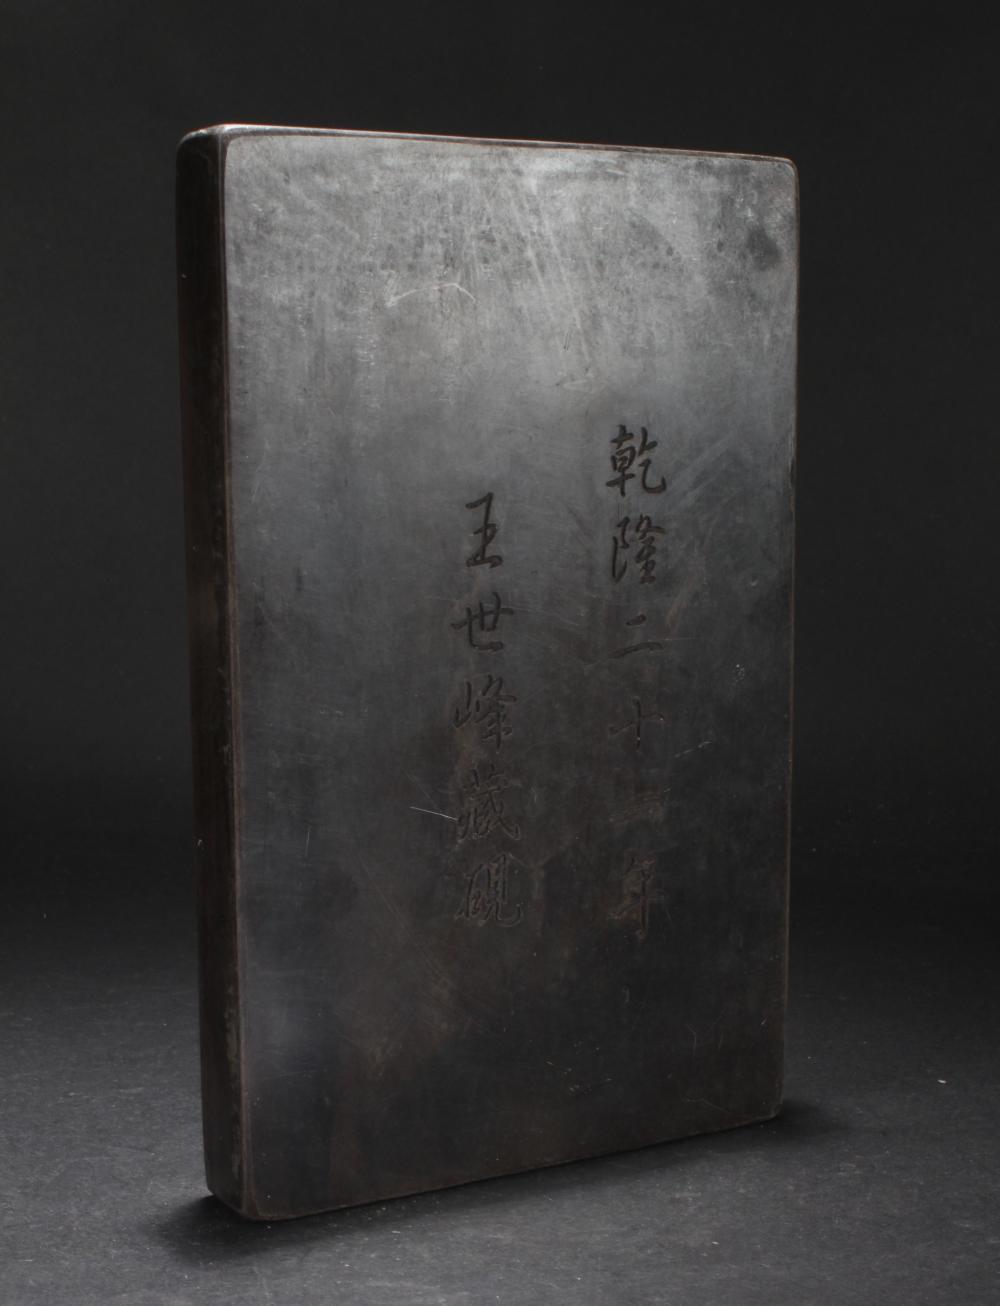 Lot 30: A Chinese Myth-beast Anicent-framing Estate Inkpad Display